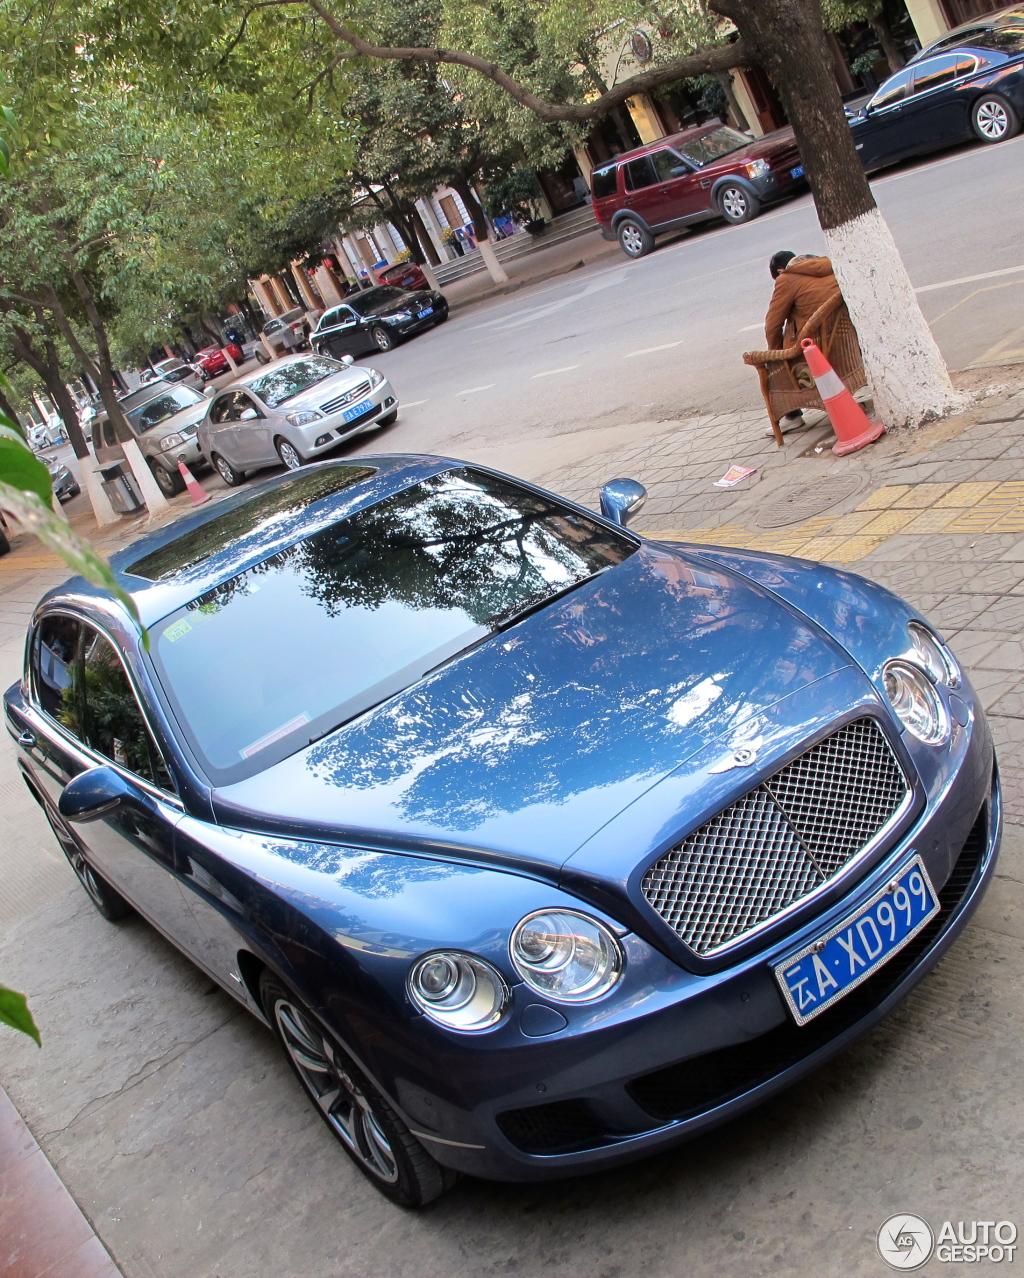 Modellbeschreibung Zum Bentley Continental Flying Spur: Bentley Continental Flying Spur China Design Series